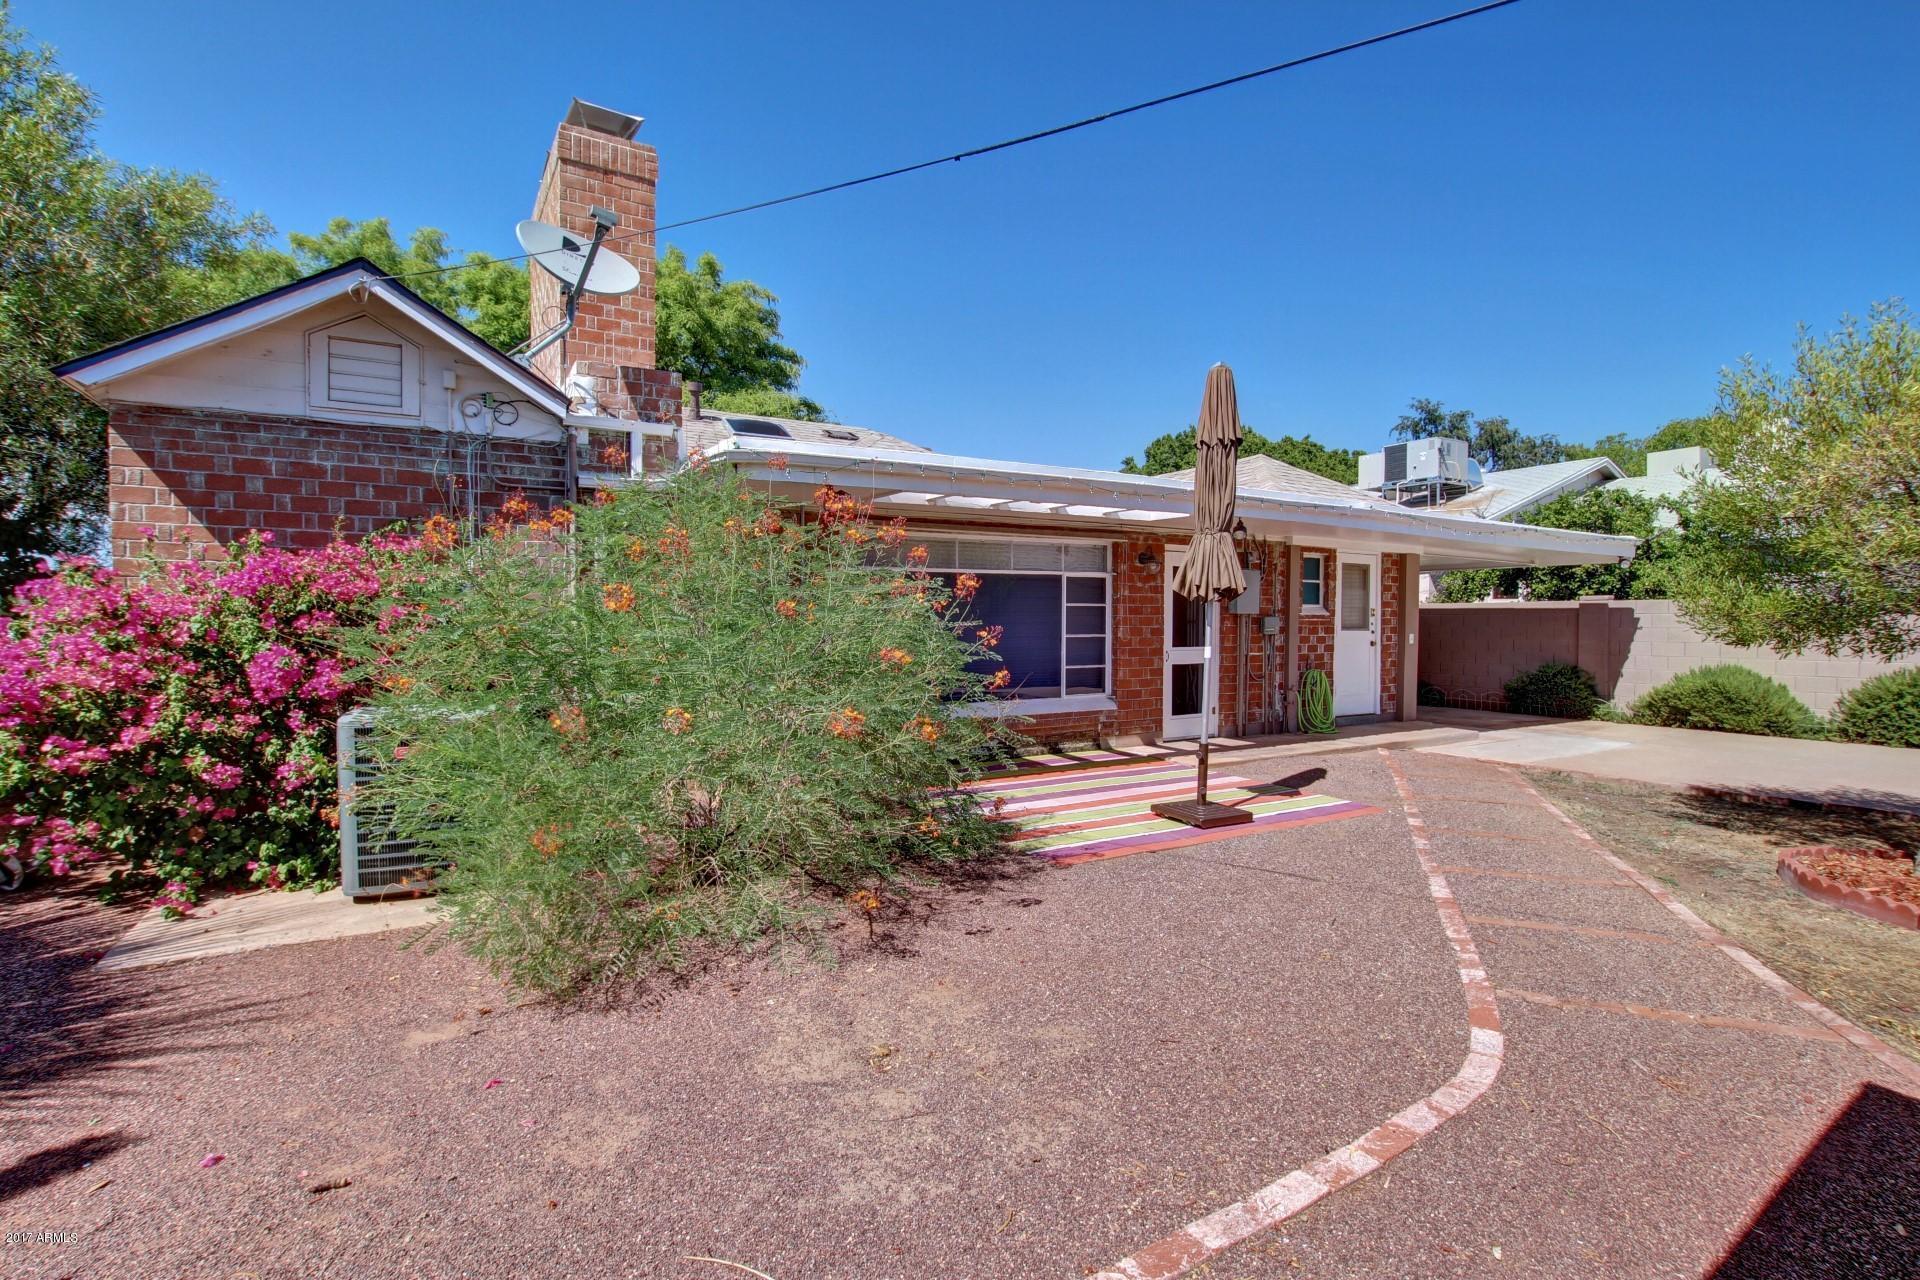 MLS 5649263 341 W CAMBRIDGE Avenue, Phoenix, AZ 85003 Phoenix AZ Willo Historic District